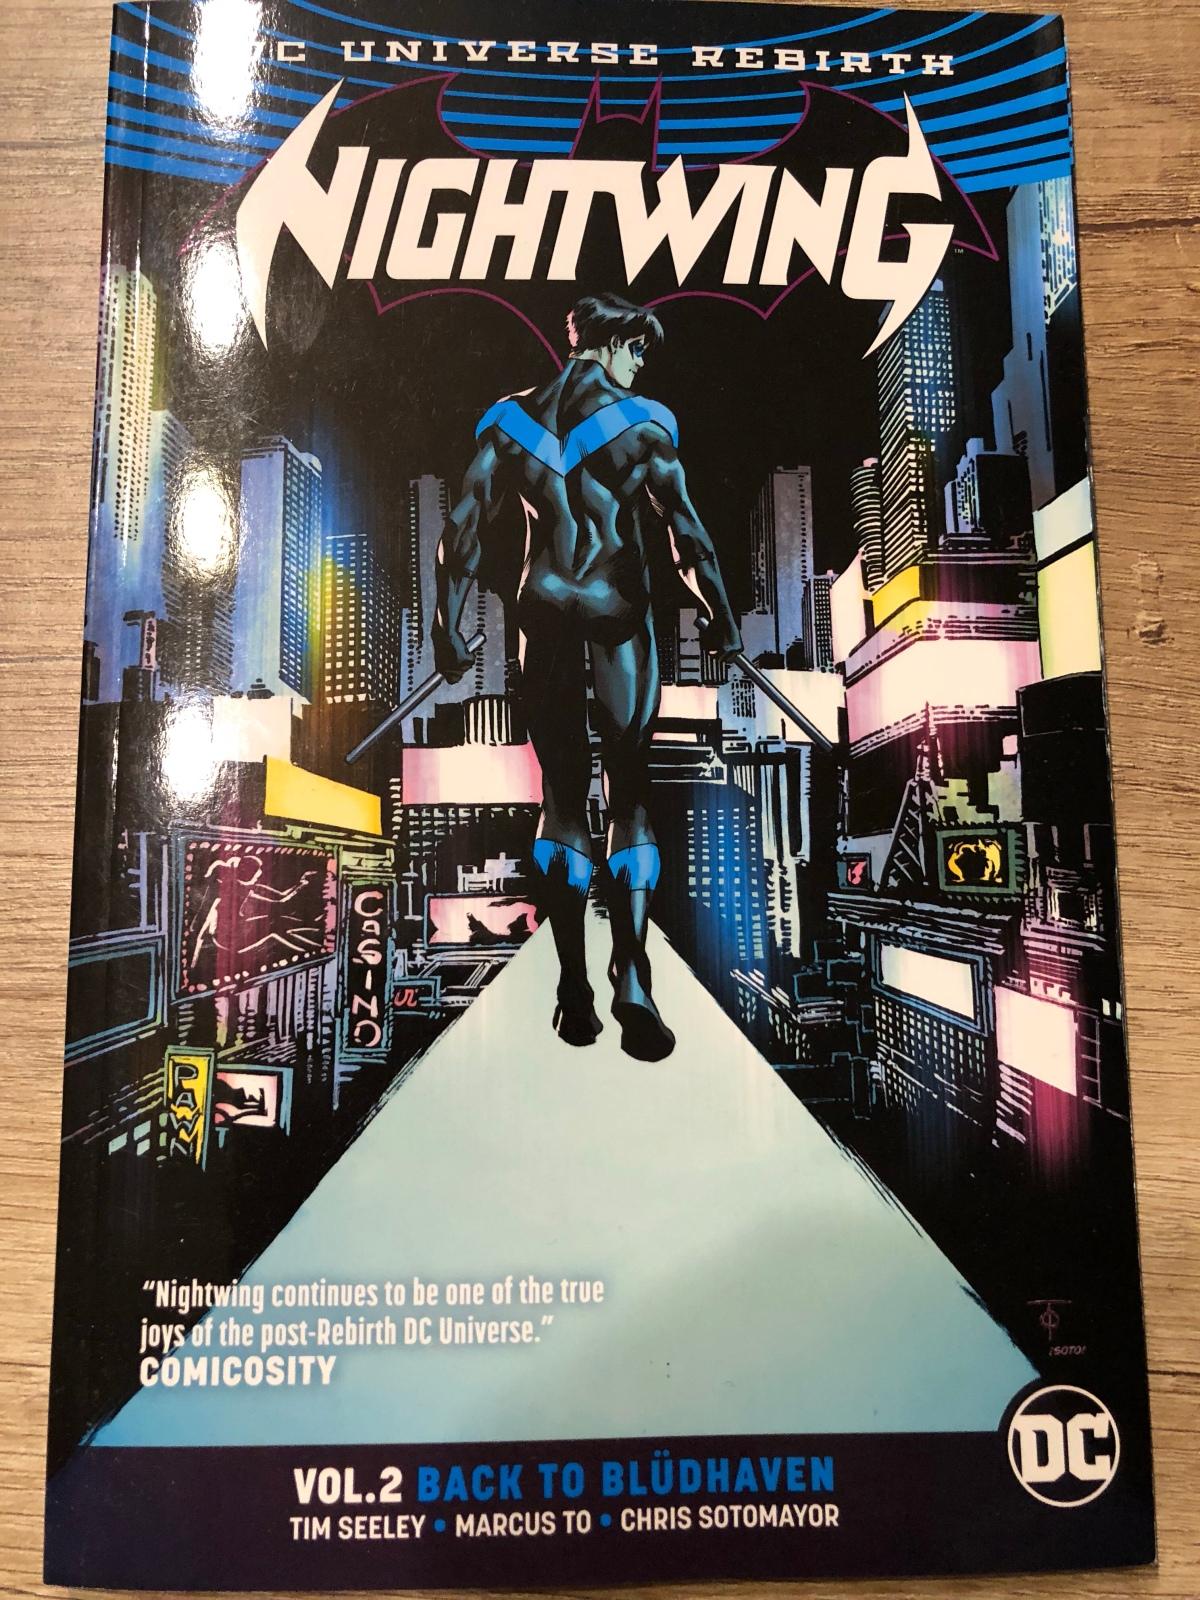 Nightwing Vol. 2: Back to Blüdhaven (DC Rebirth) |Review